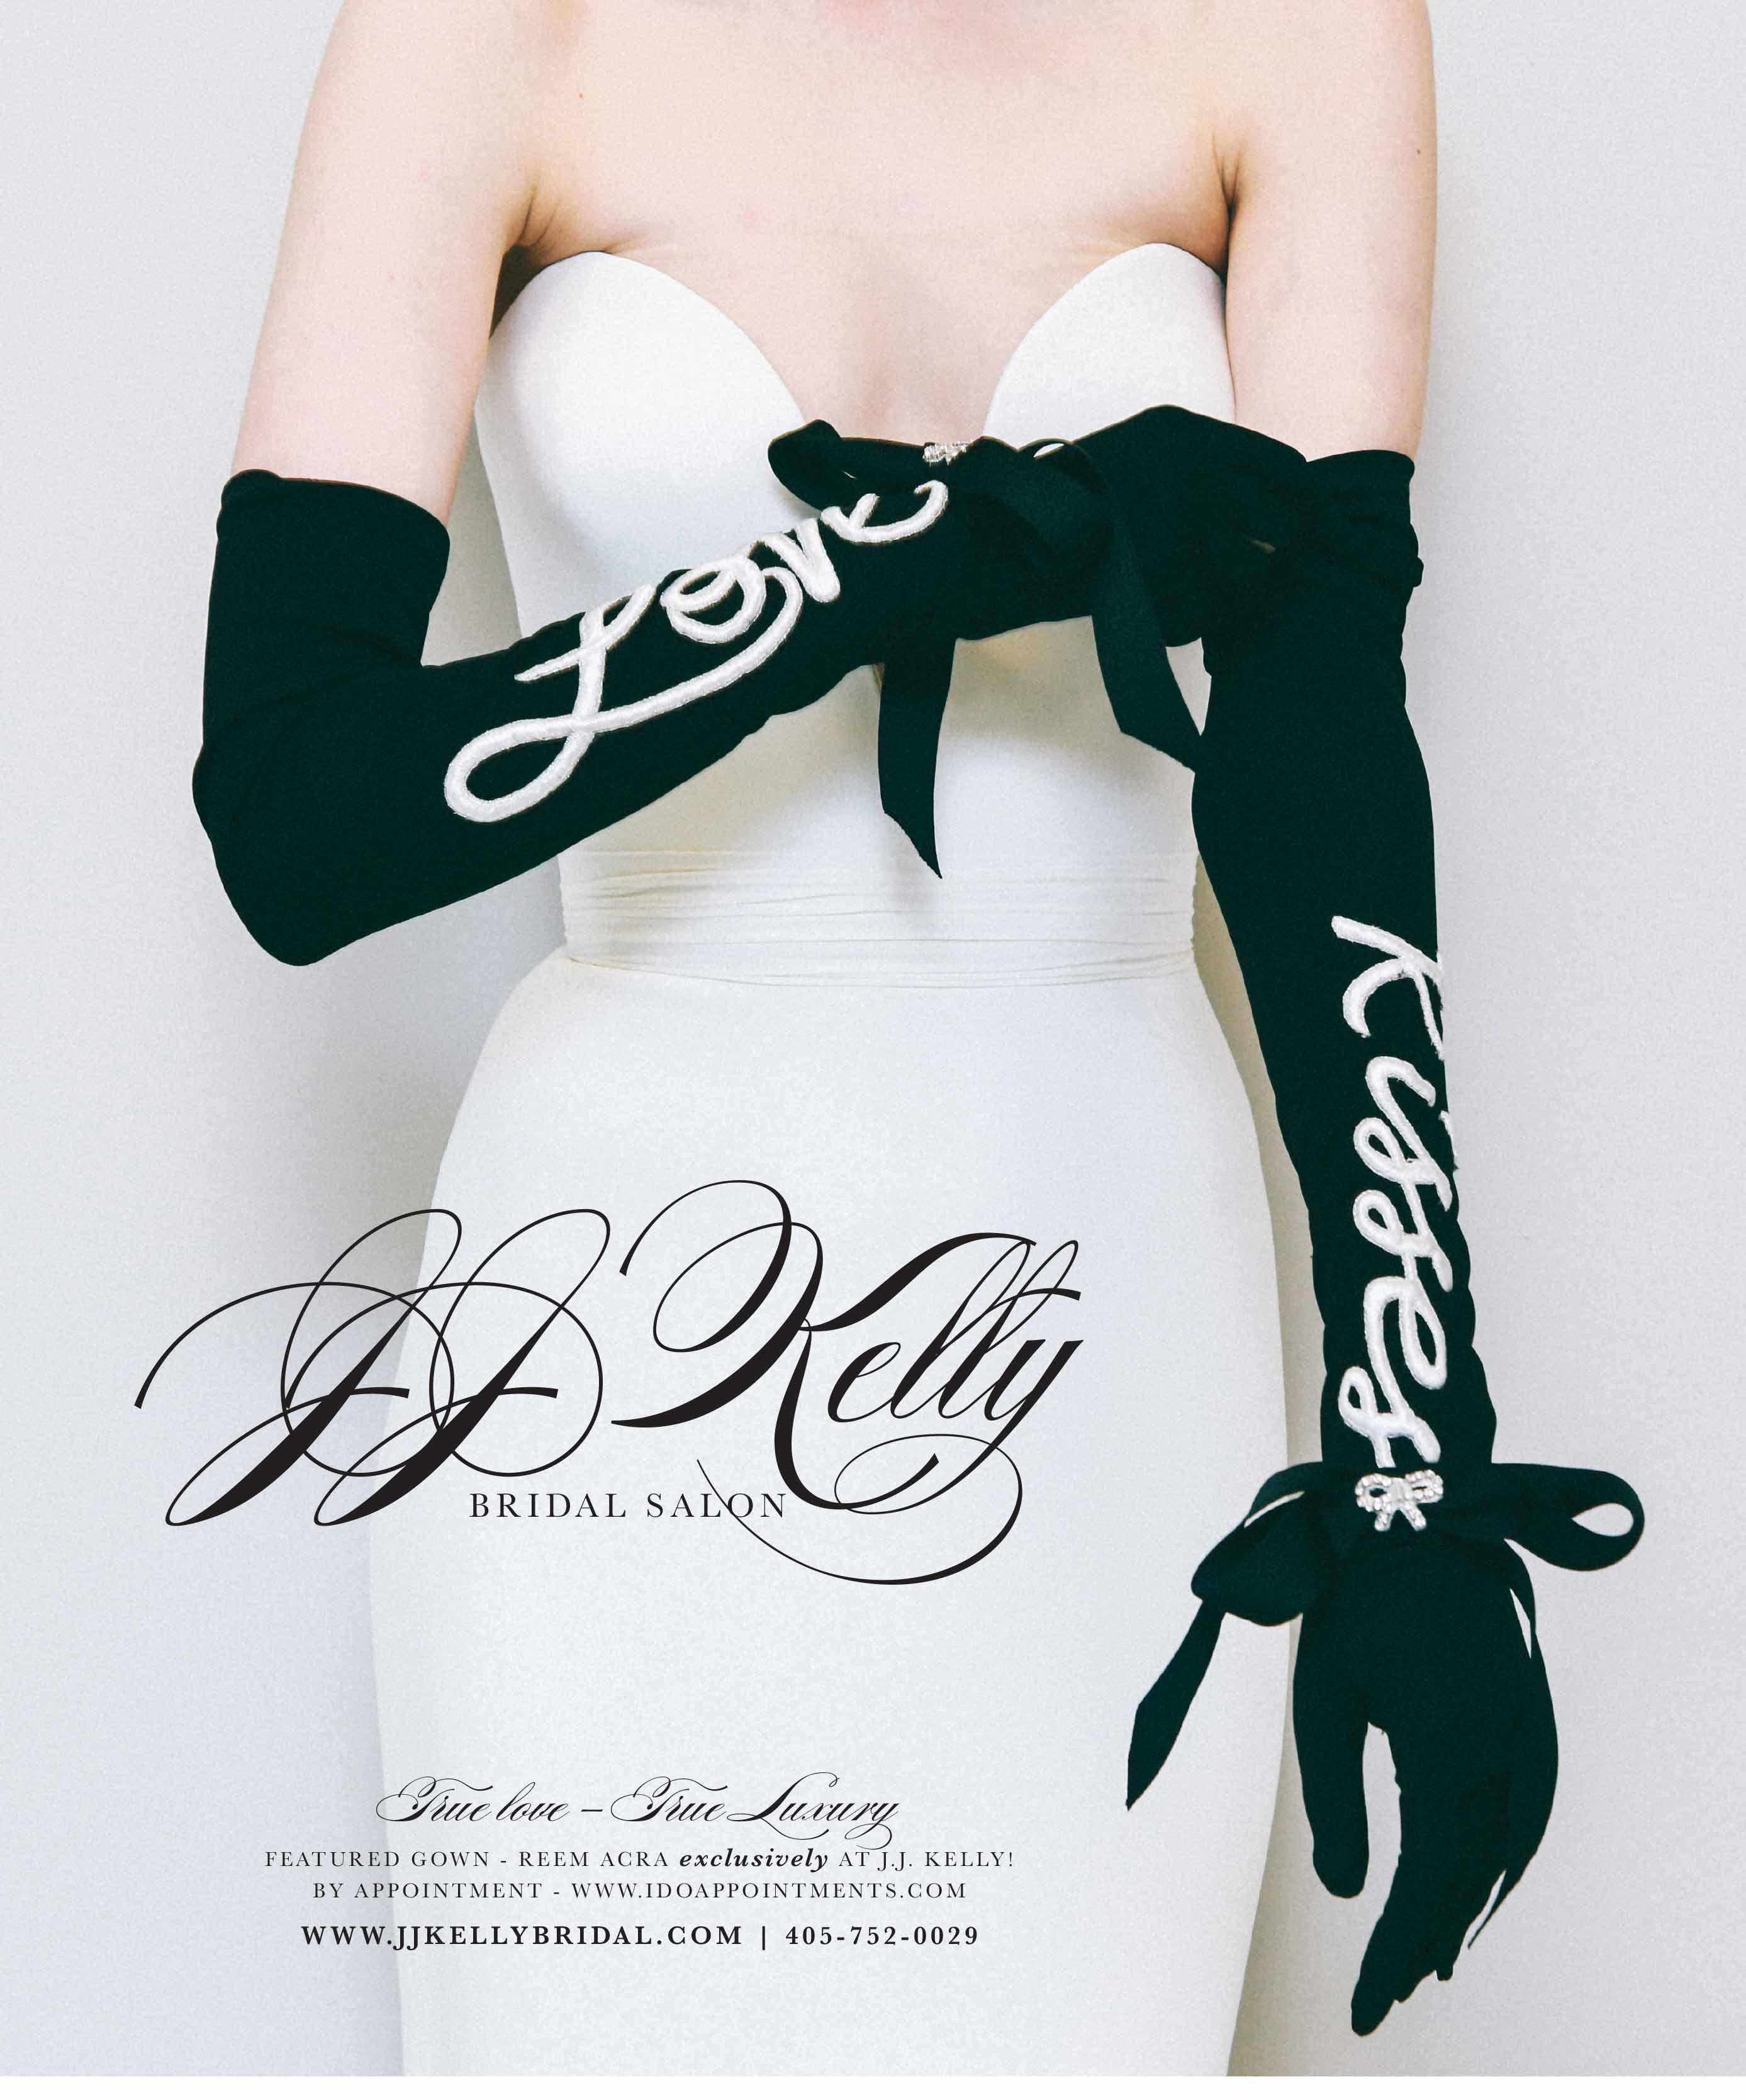 J.J. Kelly Bridal Salon Gown Preservation, Attire